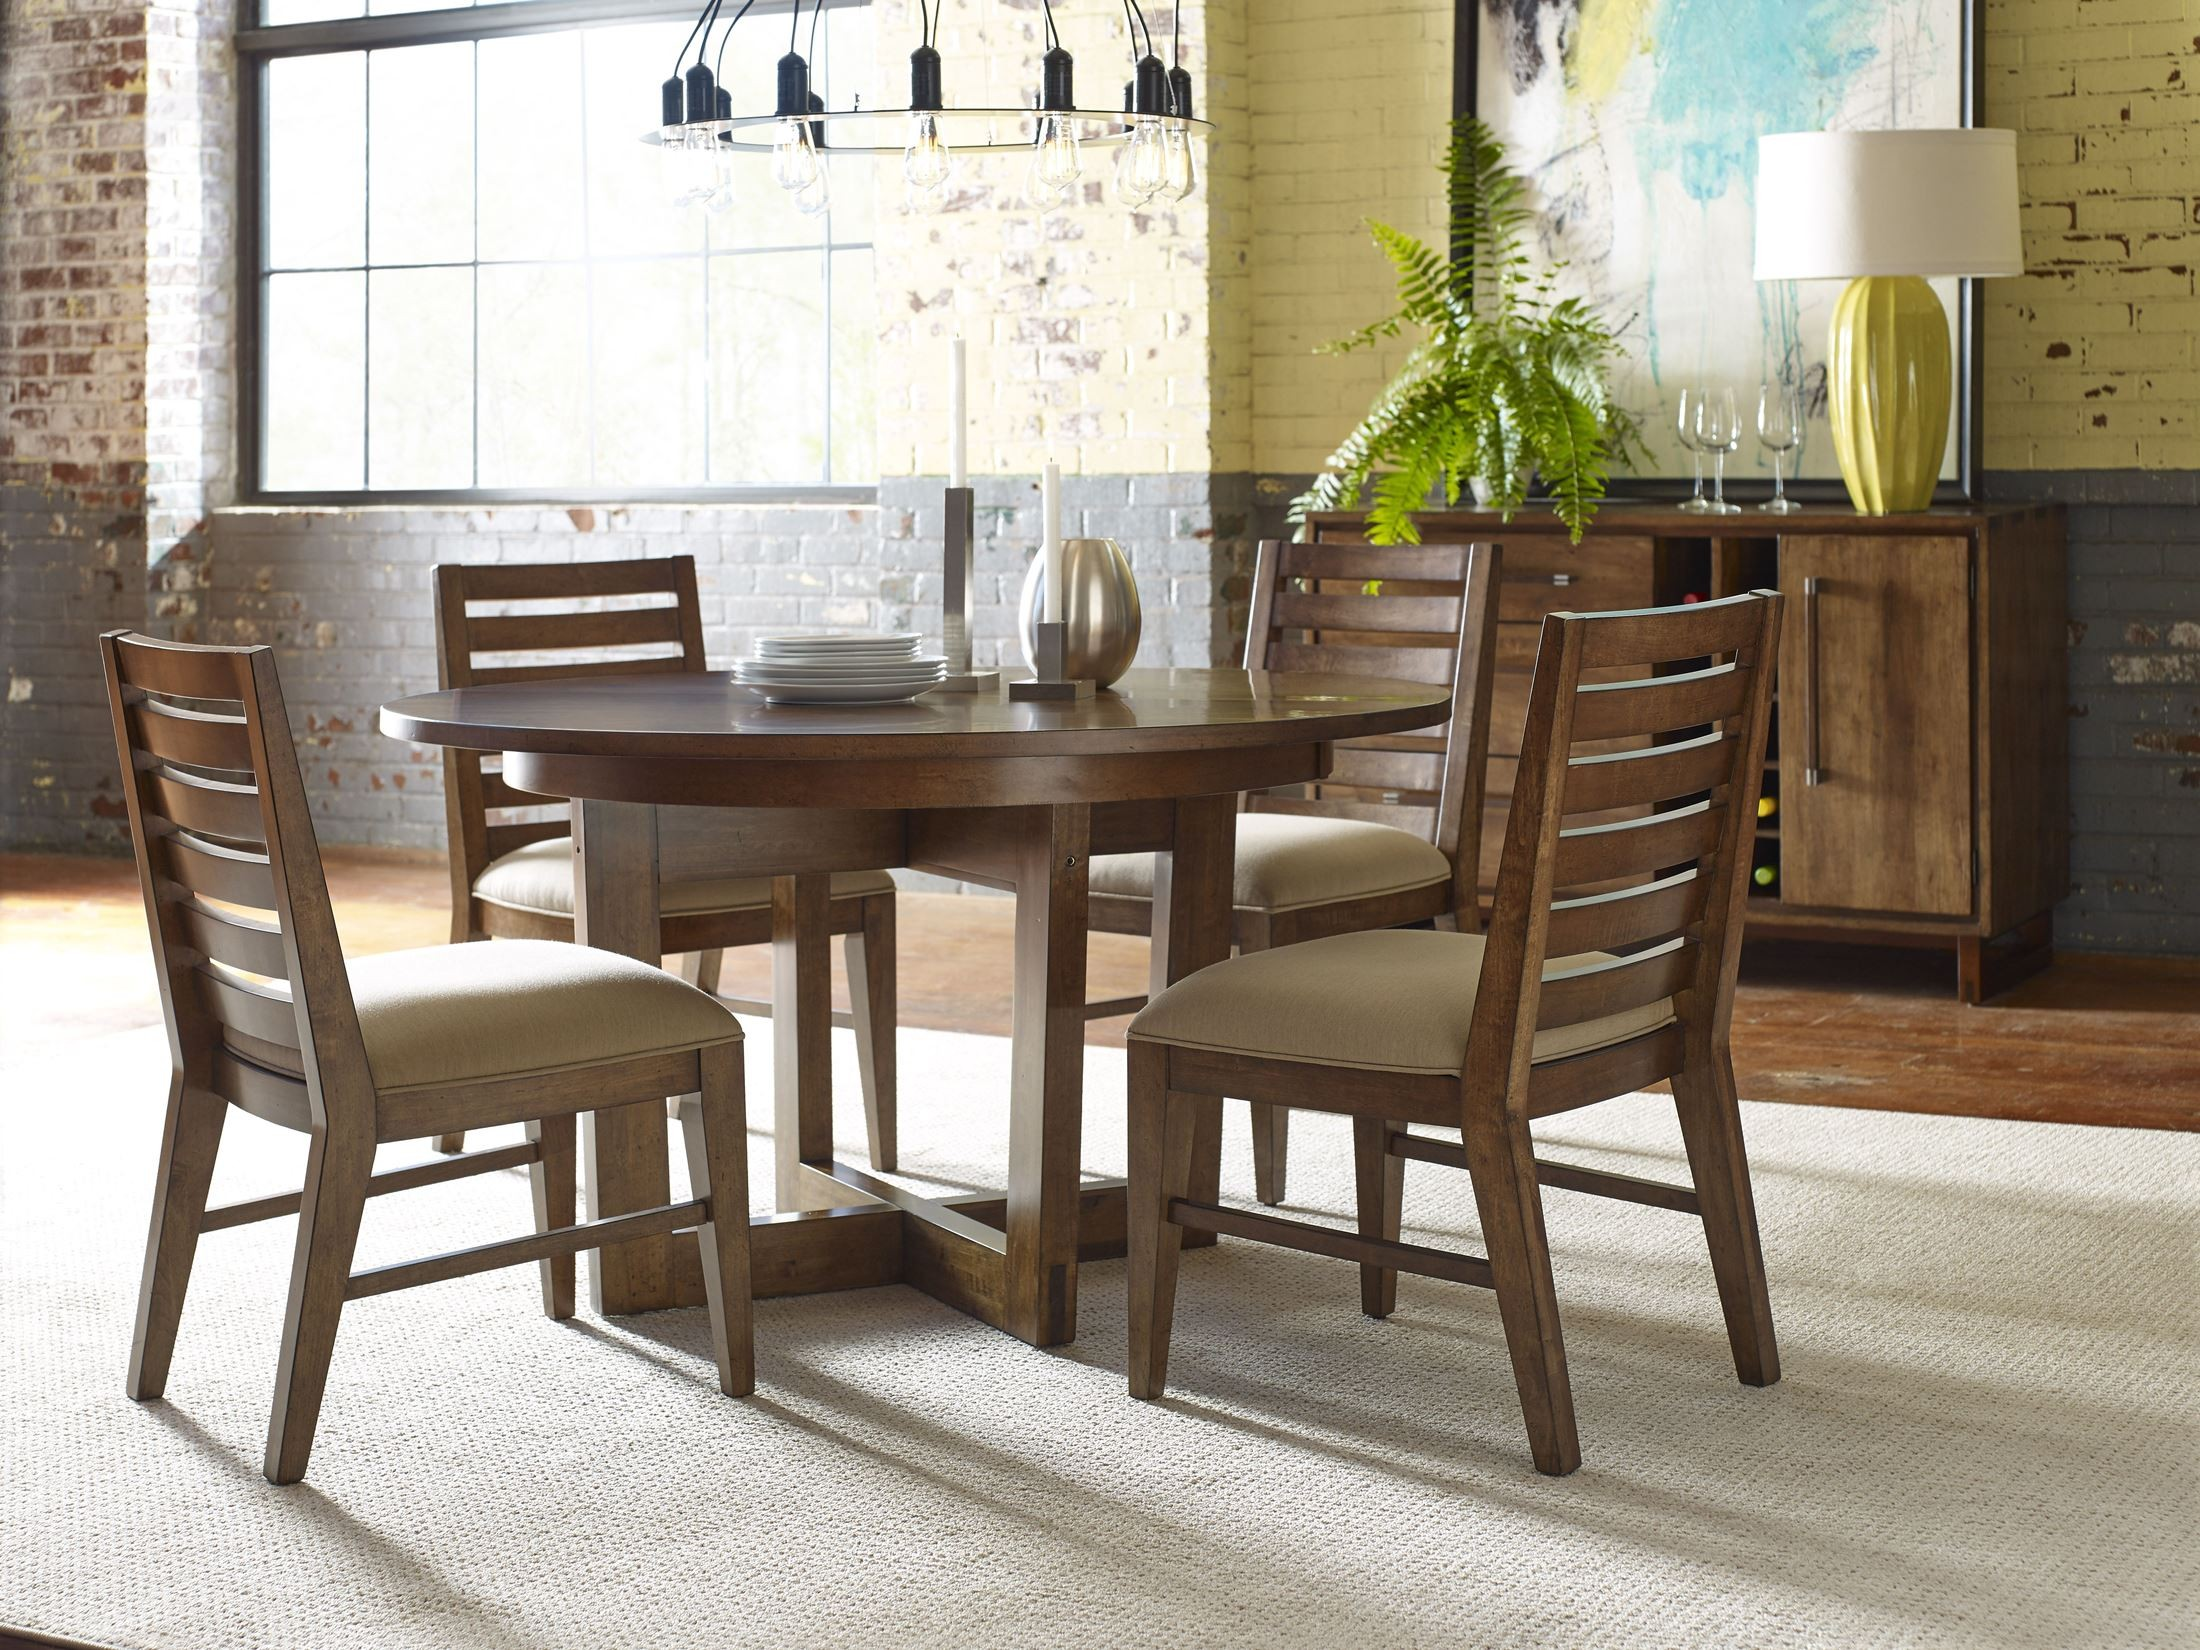 Traverse brown 54 drop leaf round dining room set from for Round dining room sets with leaf